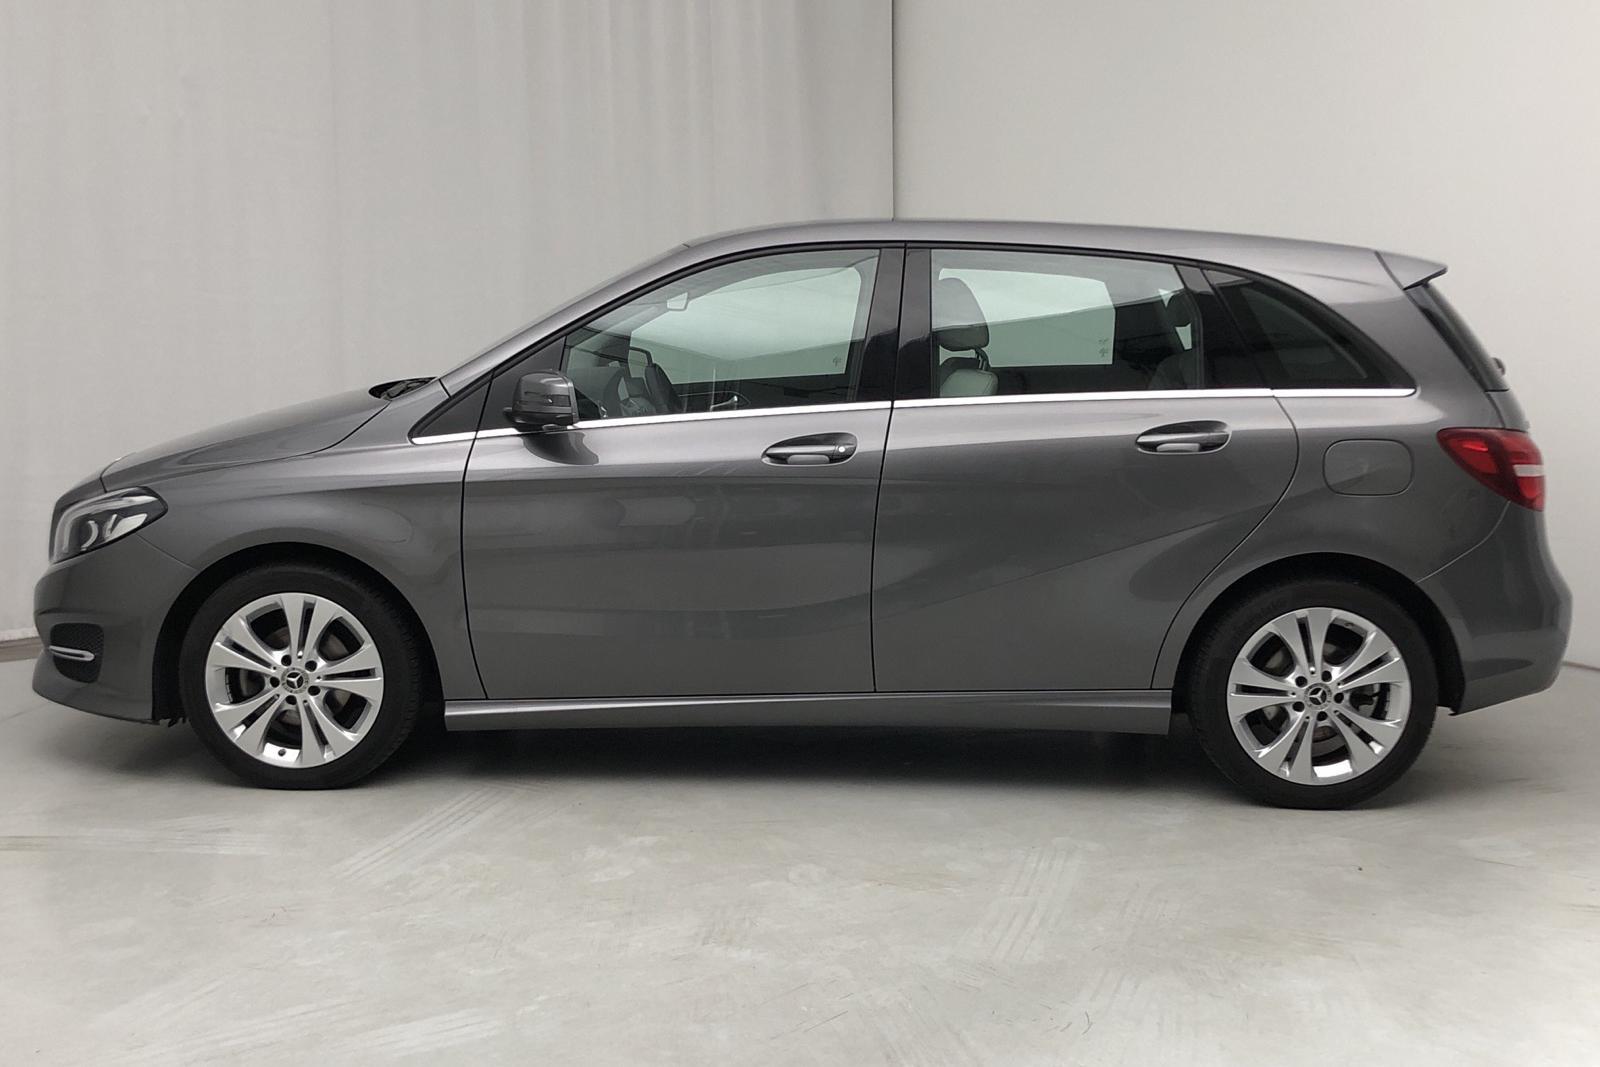 Mercedes B 180 d W246 (109hk) - 5 000 mil - Dark Grey - 2018